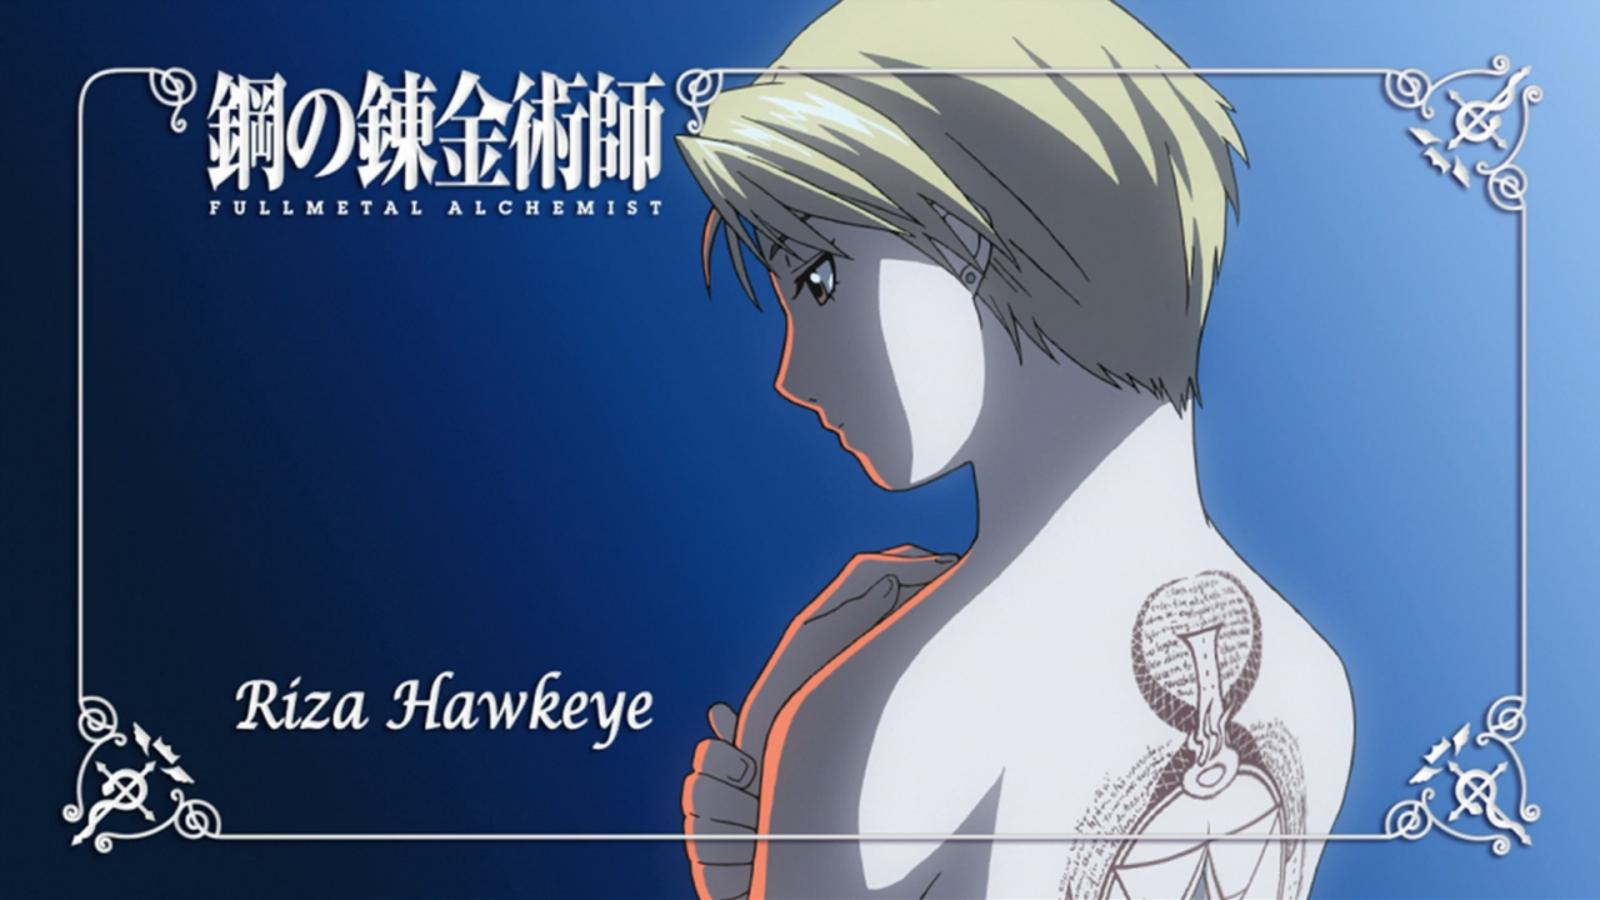 Wallpaper : illustration, anime, cartoon, brand, Fullmetal Alchemist Brotherhood, Riza Hawkeye ...